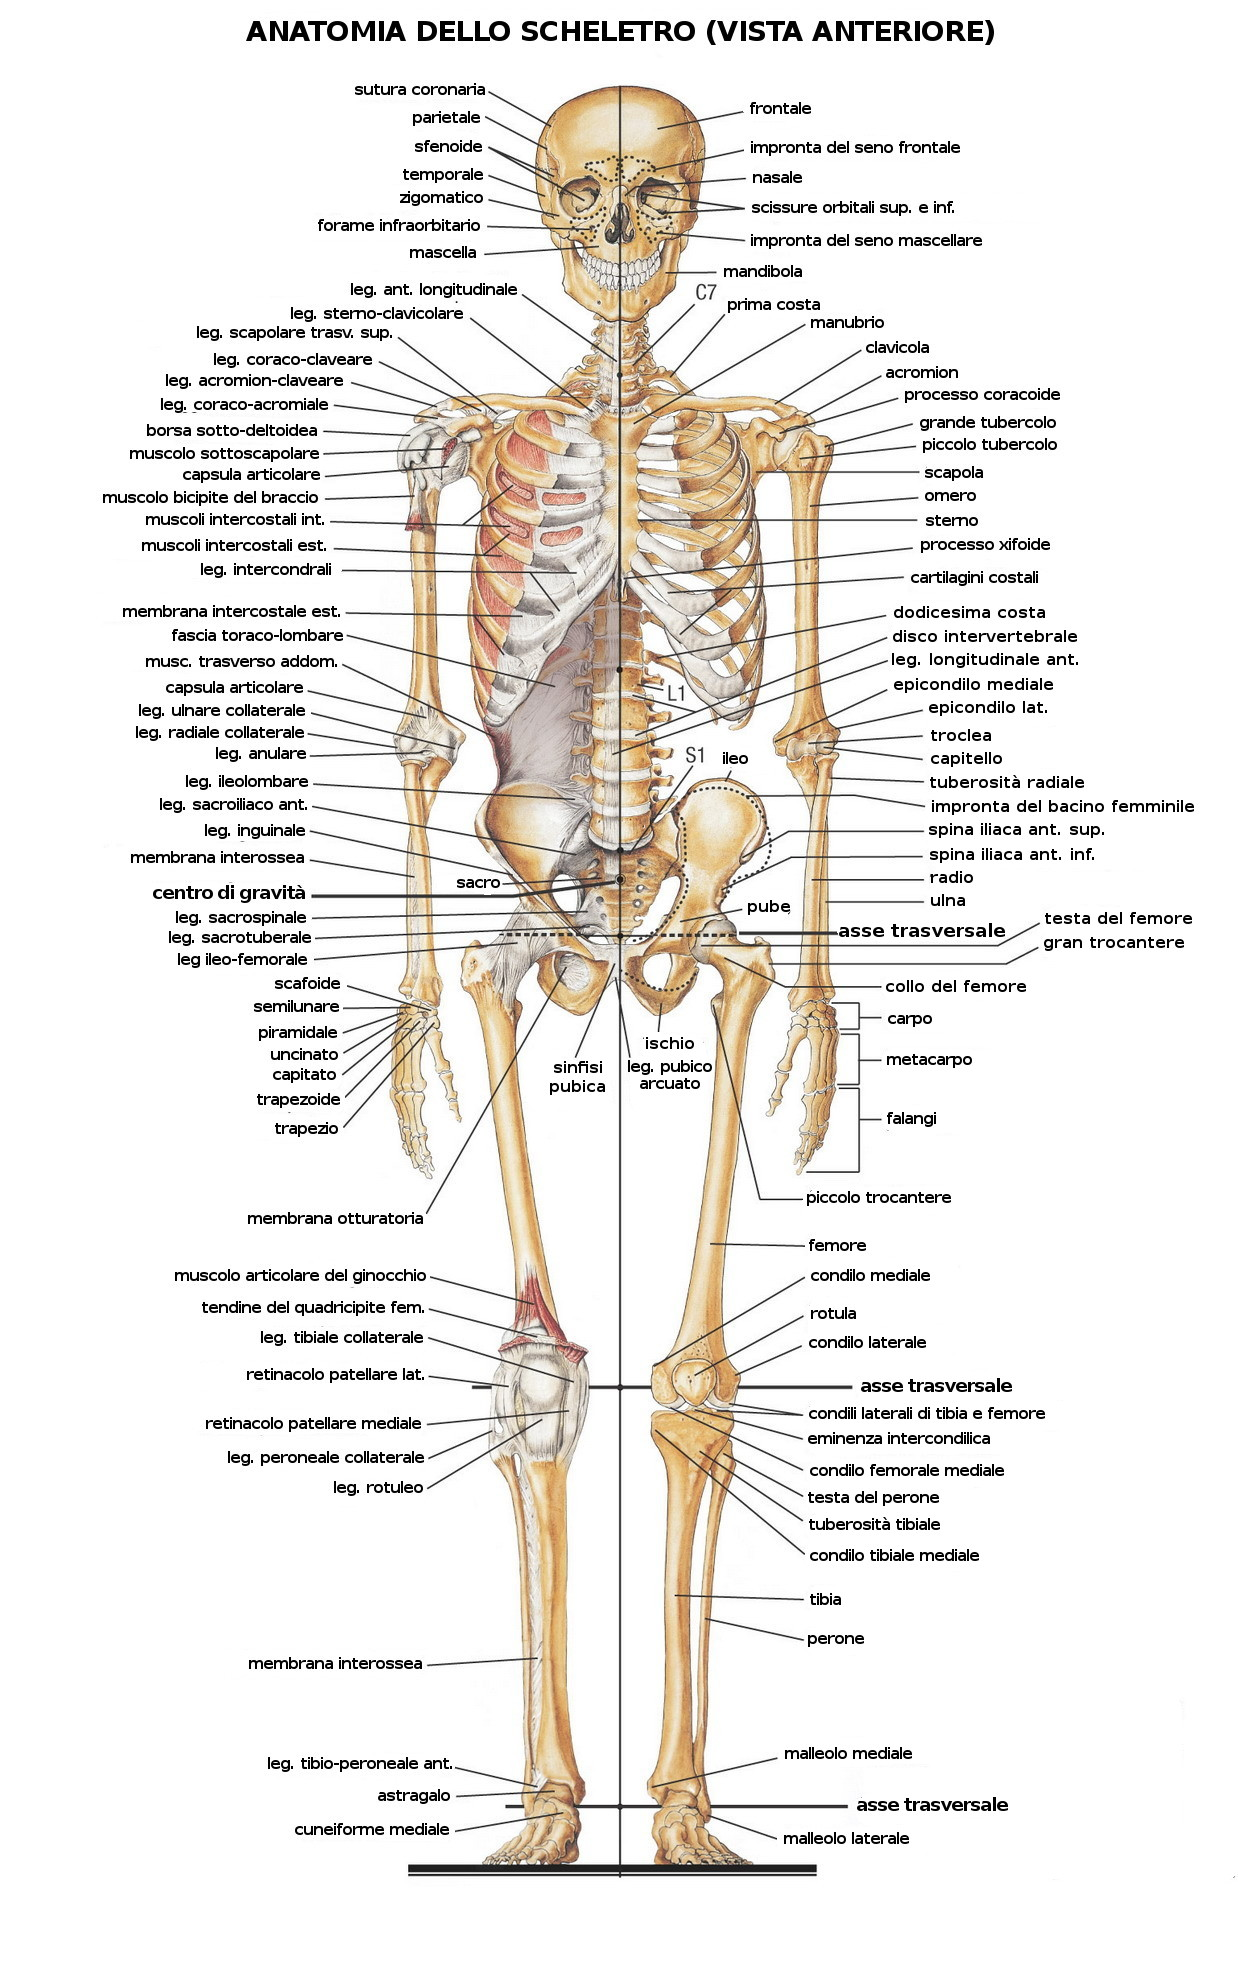 scheletro umano ortopedico legnano biusto arsizio busto garolfo poliambulatorio bustese